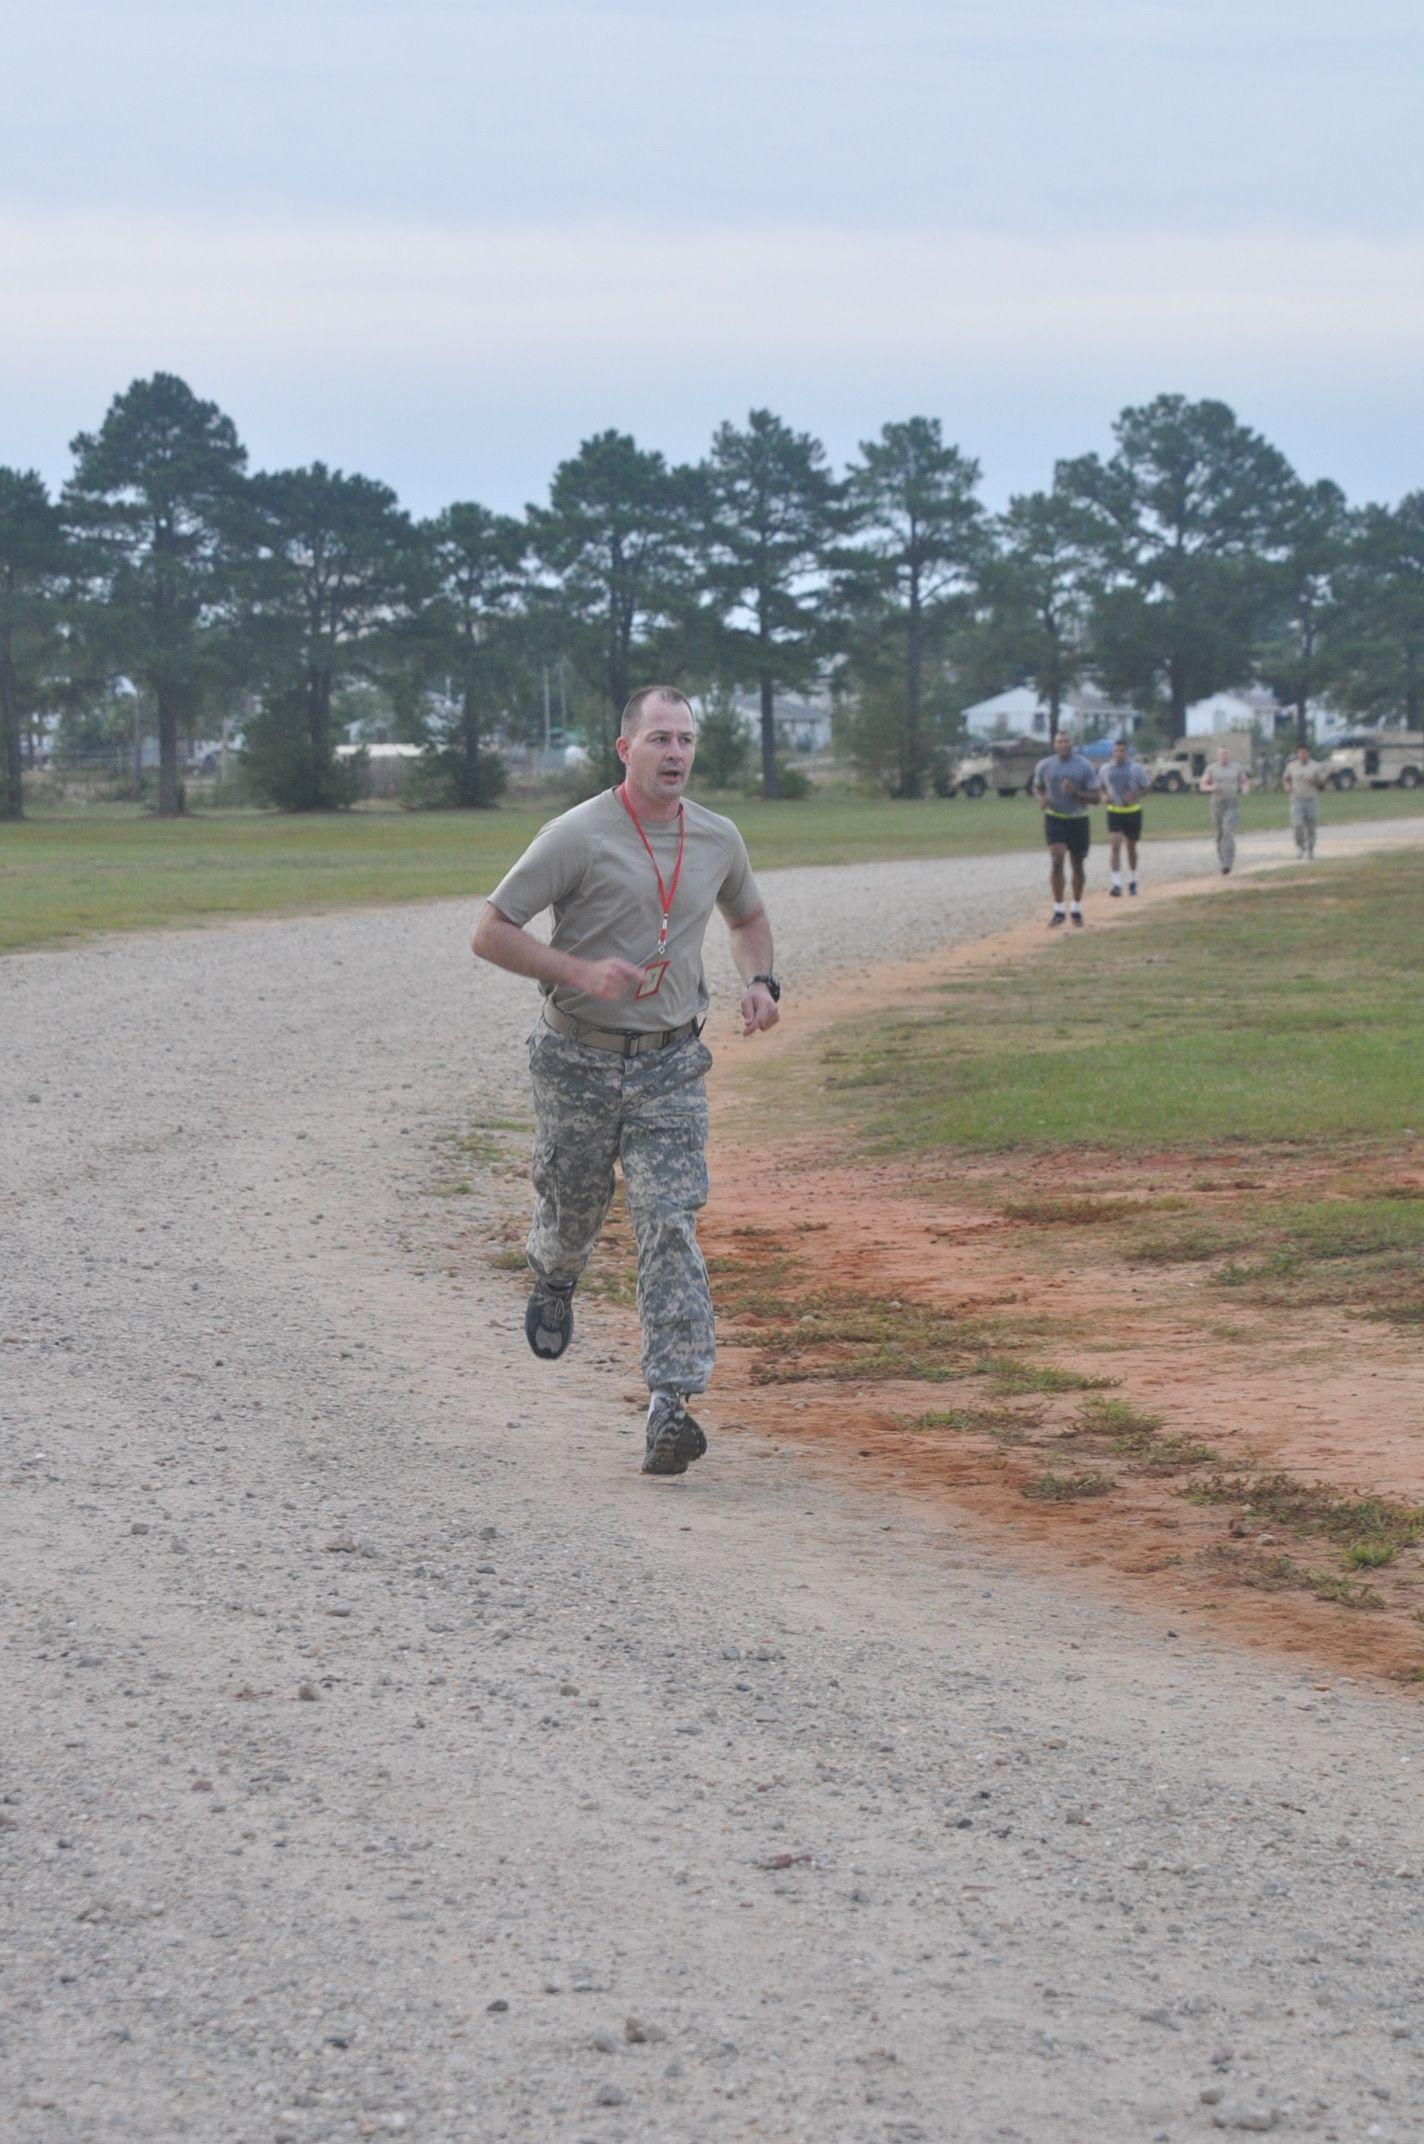 1st. Lt. John Galan finishing the twomile run portion of